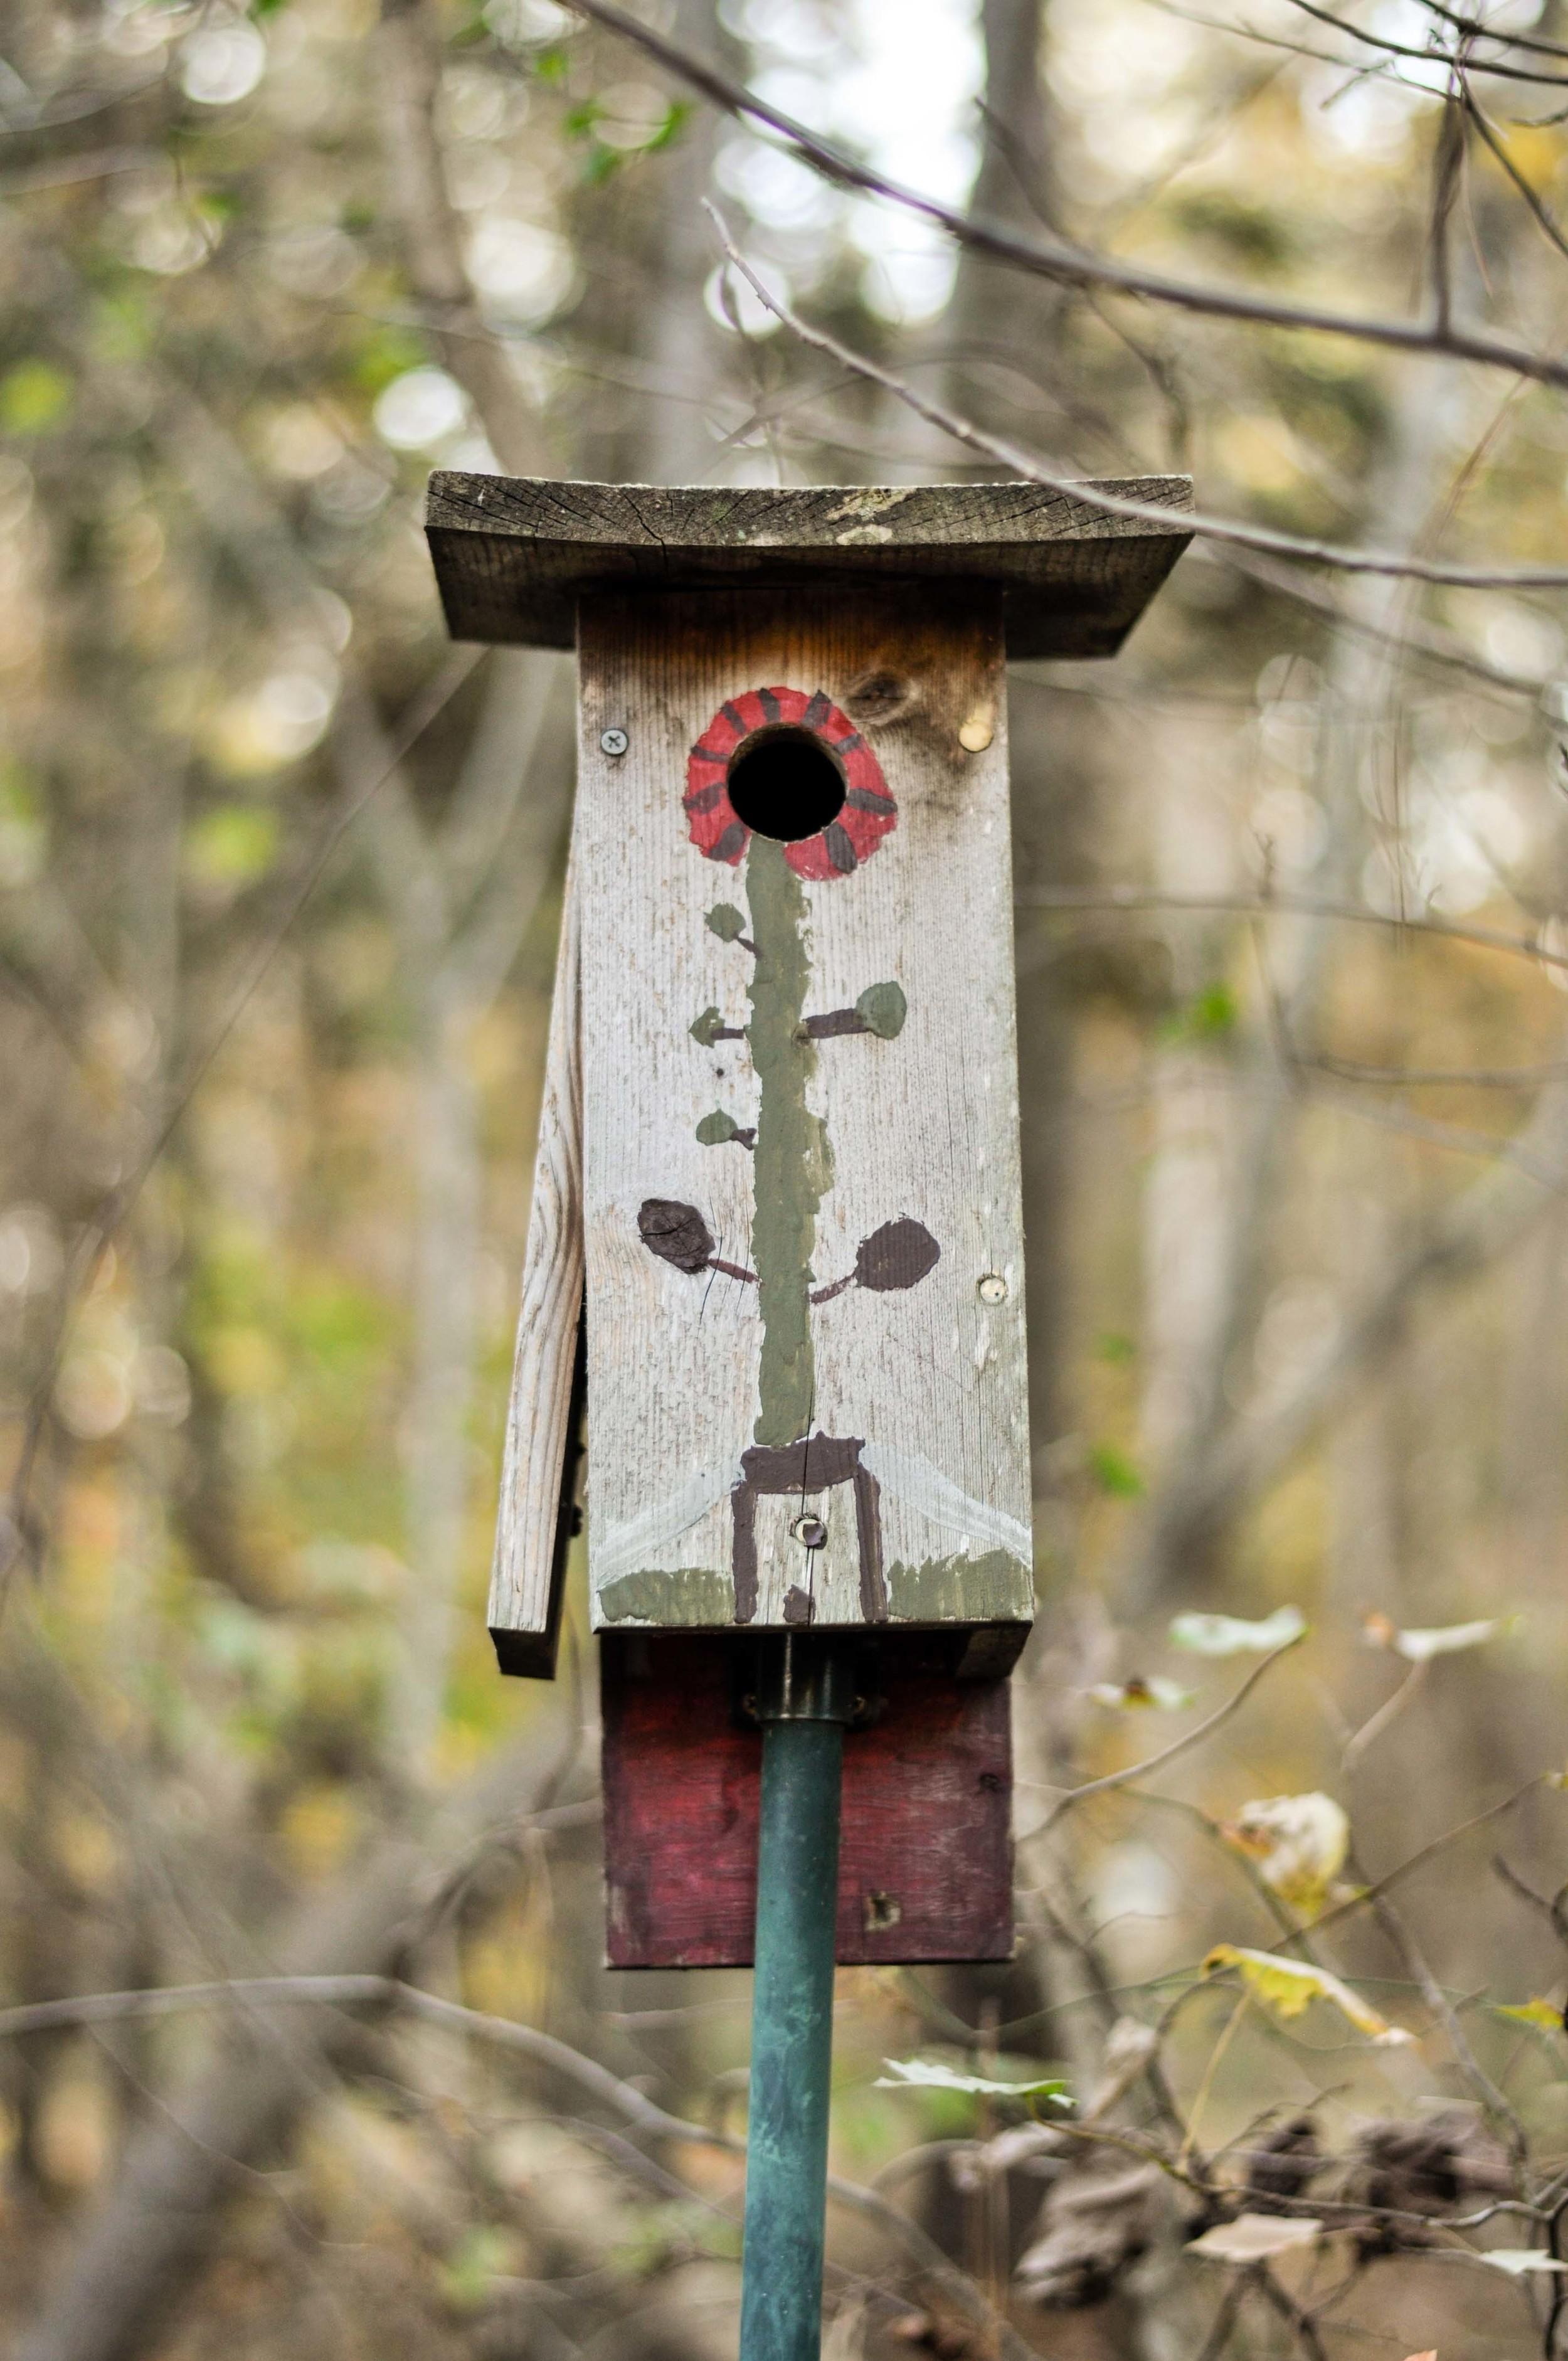 bass lake bird houses_8.jpg